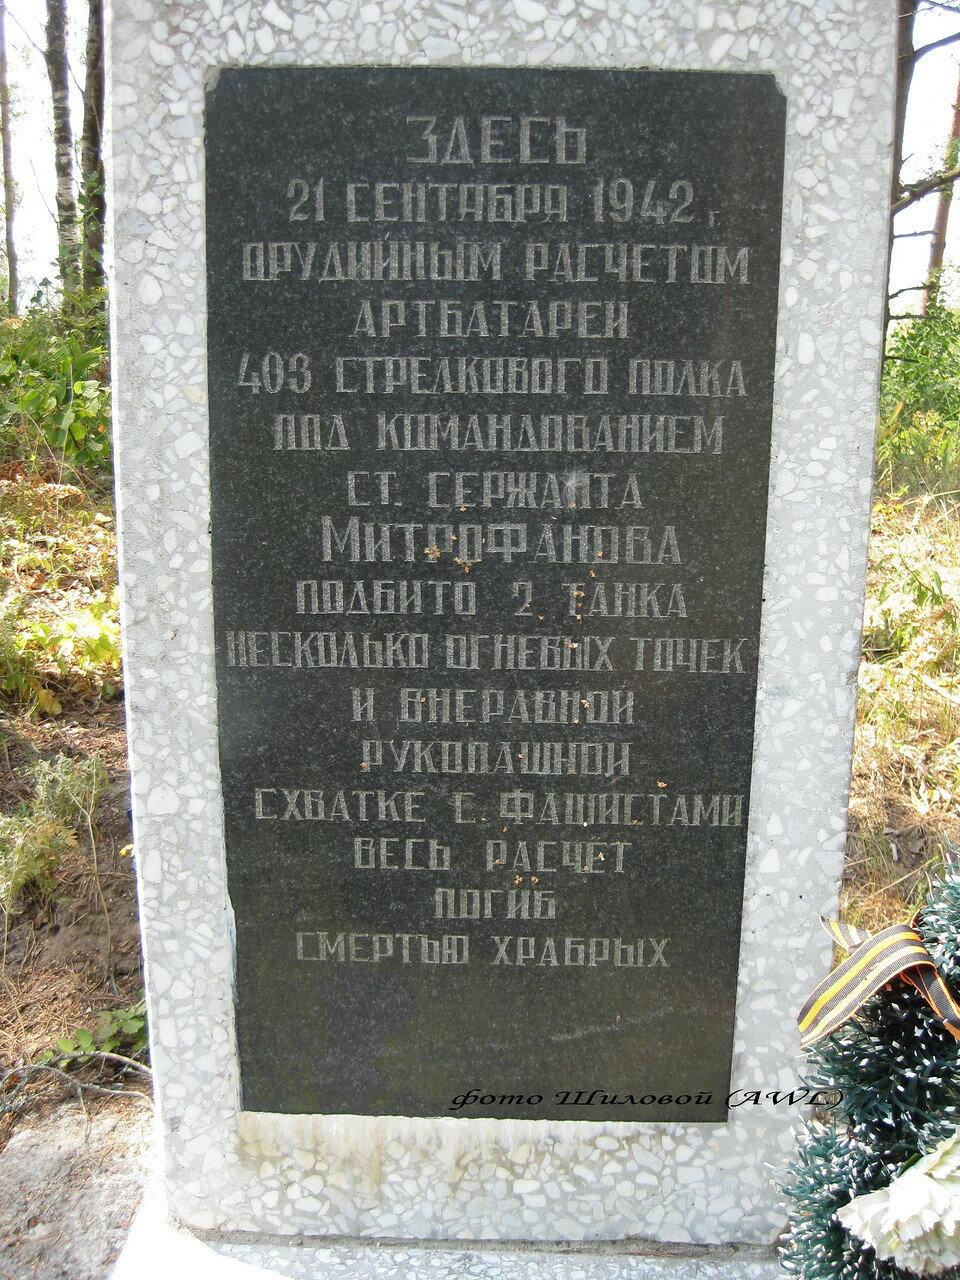 https://img-fotki.yandex.ru/get/67221/199368979.2/0_18f531_c86a778c_XXXL.jpg